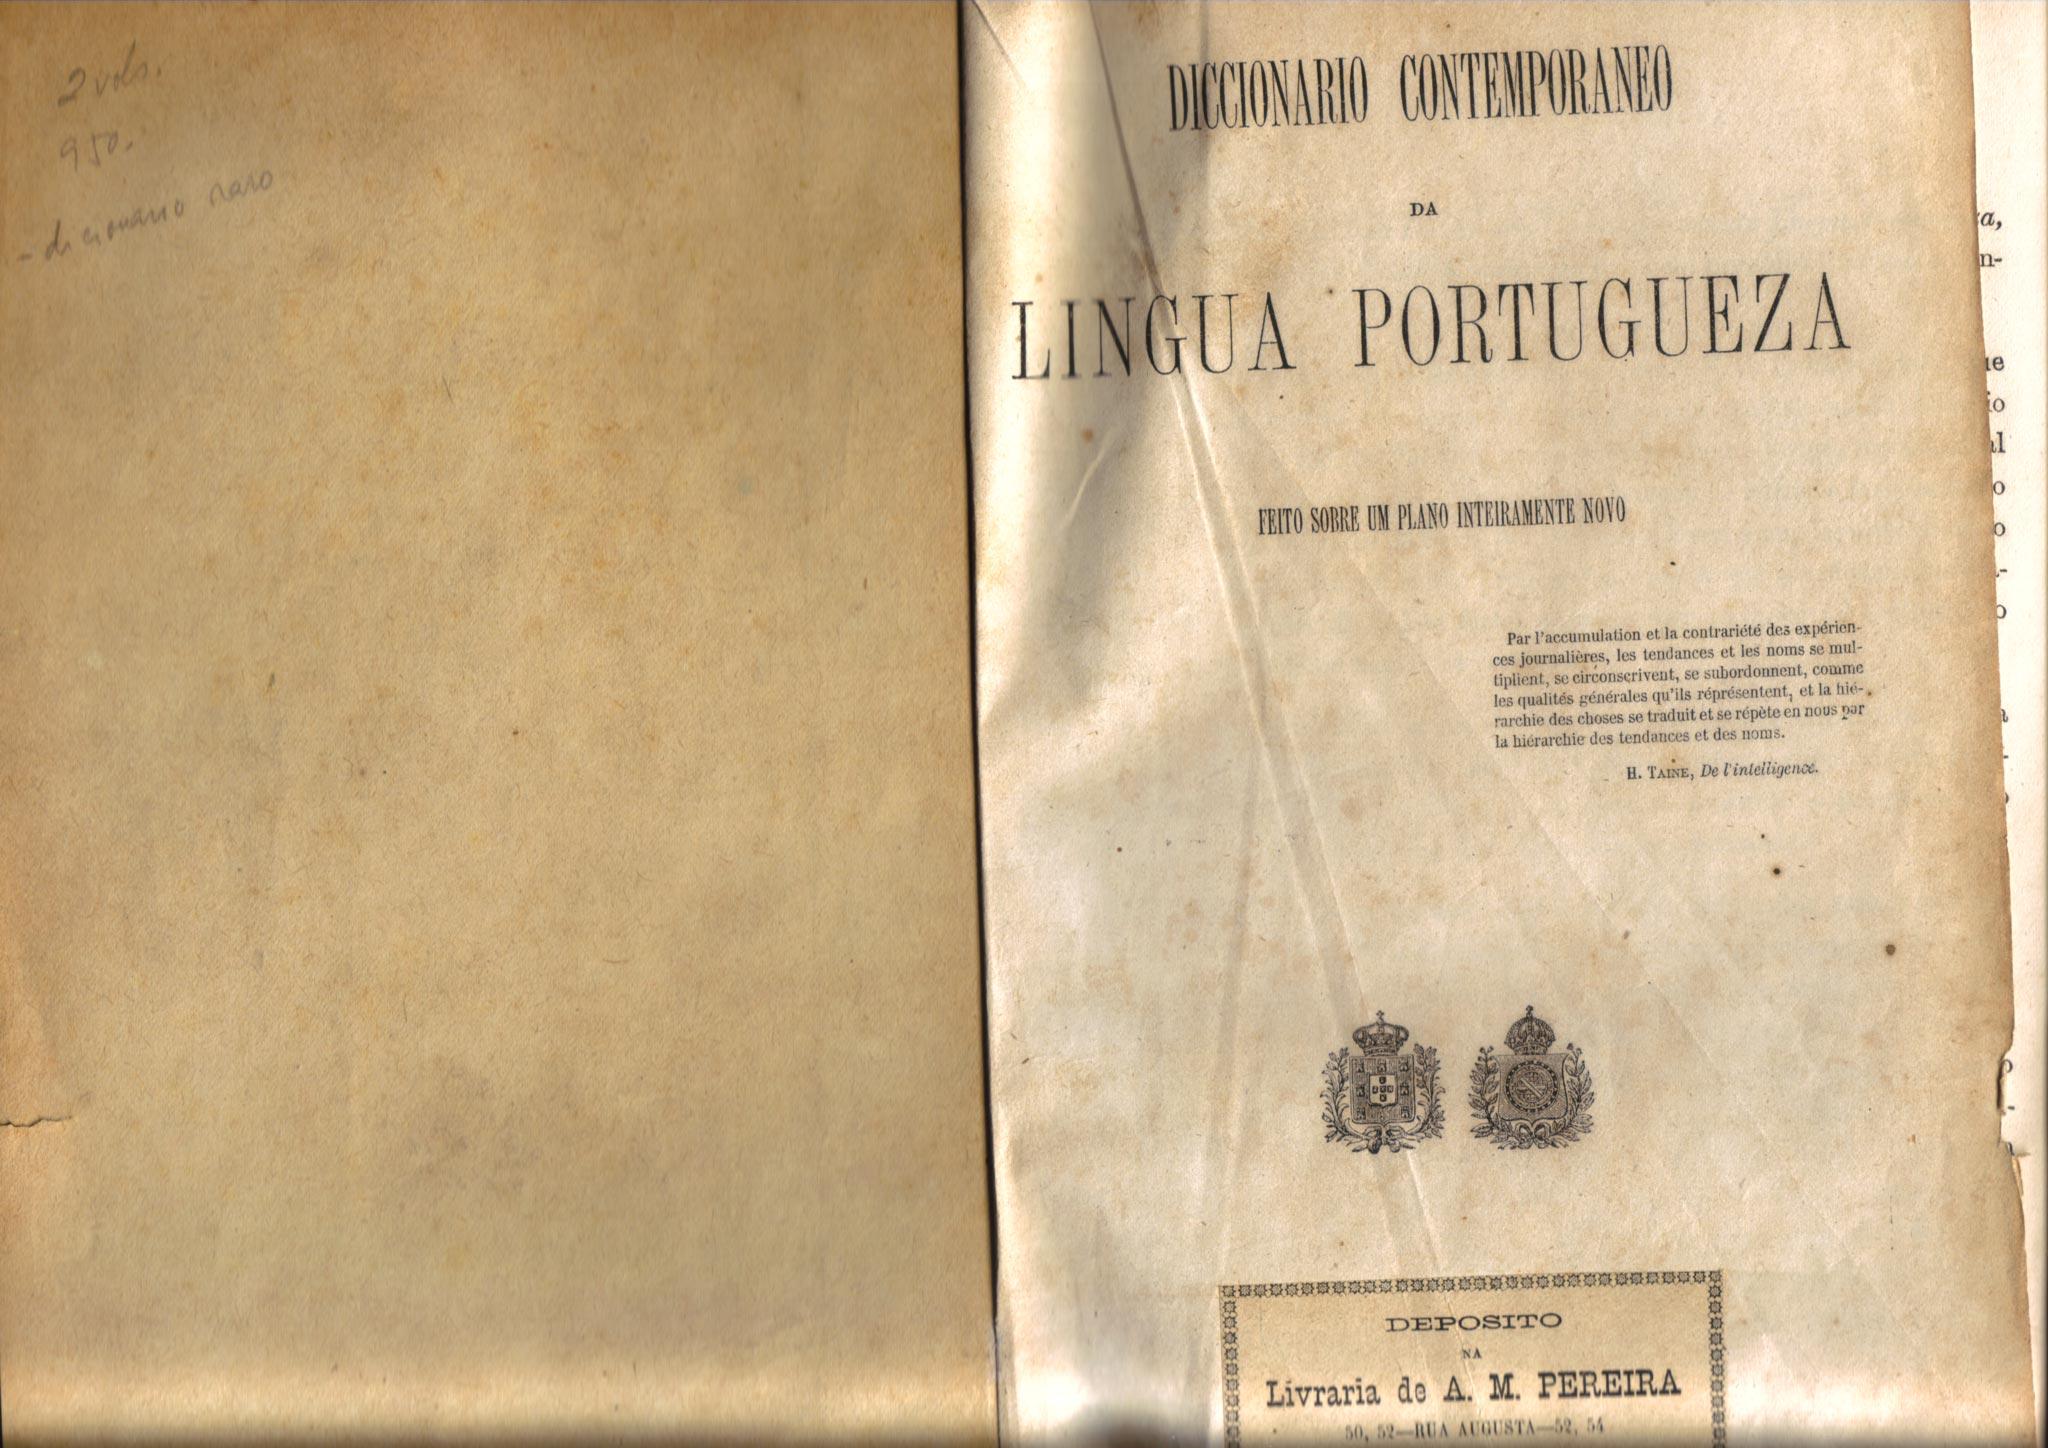 Diccionario Contemporaneo da Lingua Portugueza [Aulete], Lisboa, Imprensa Nacional, 1881